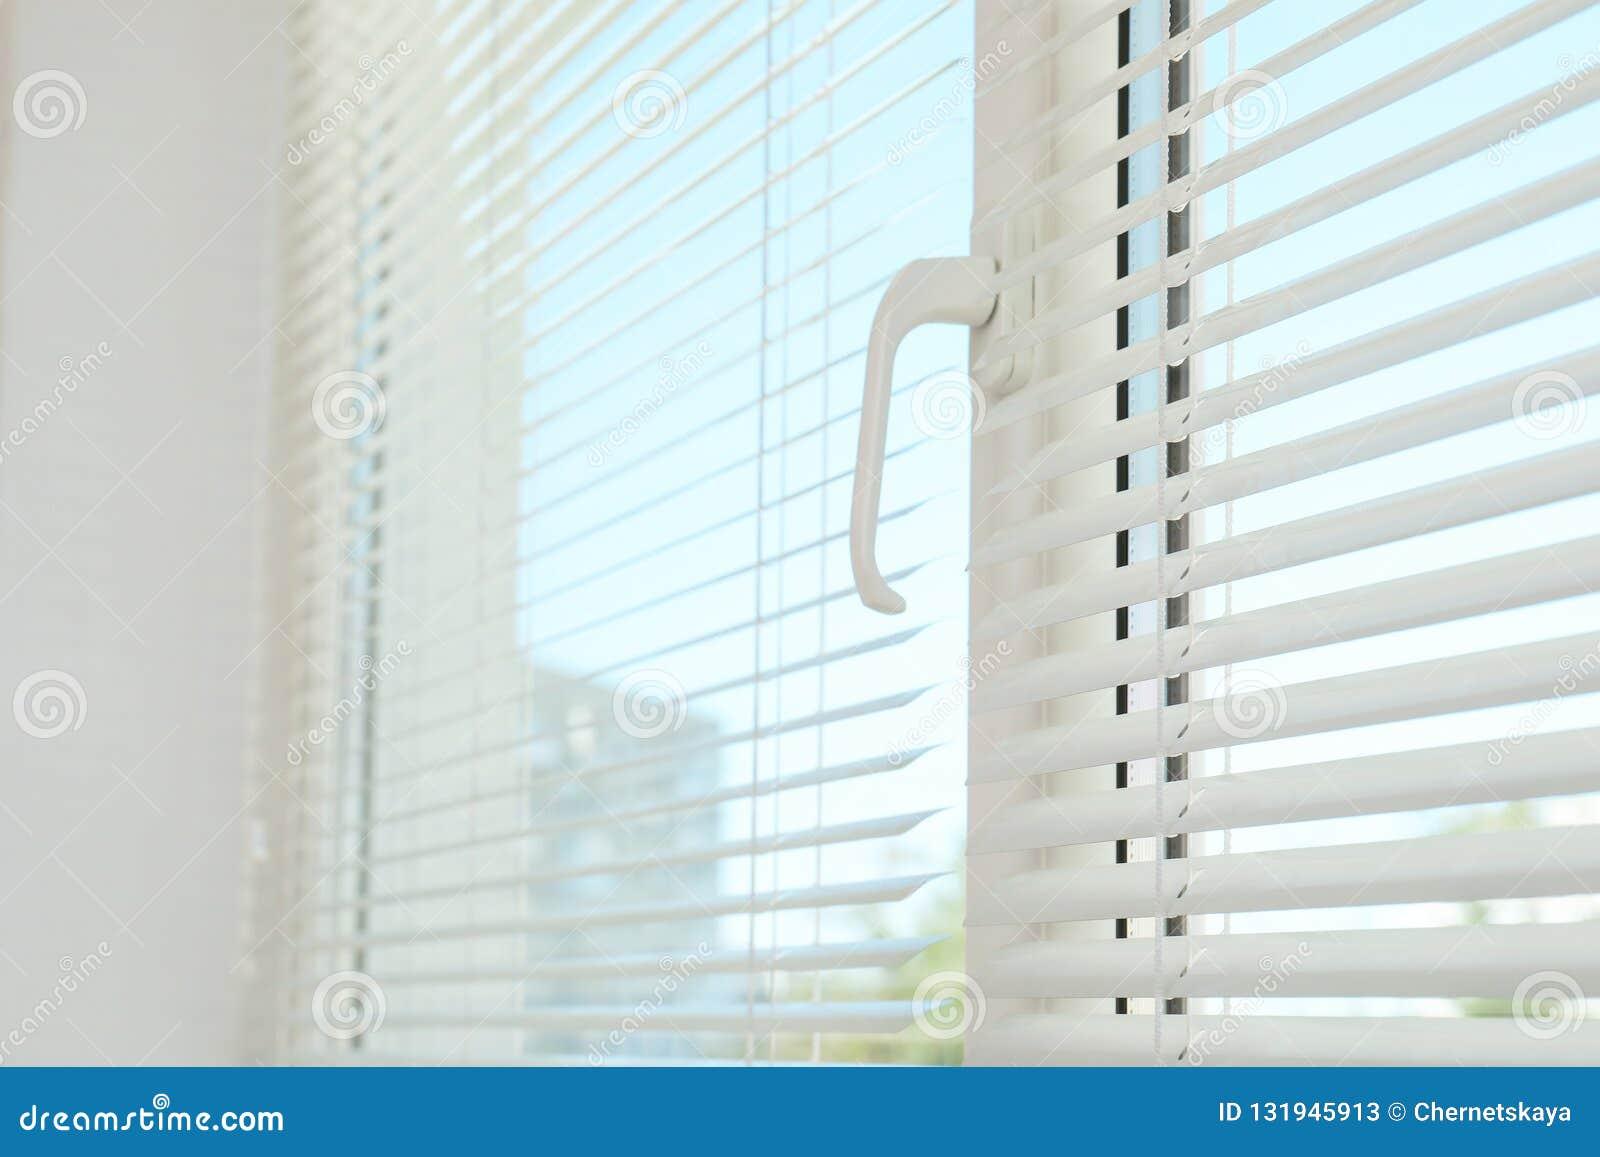 Nuova finestra moderna con i ciechi all interno